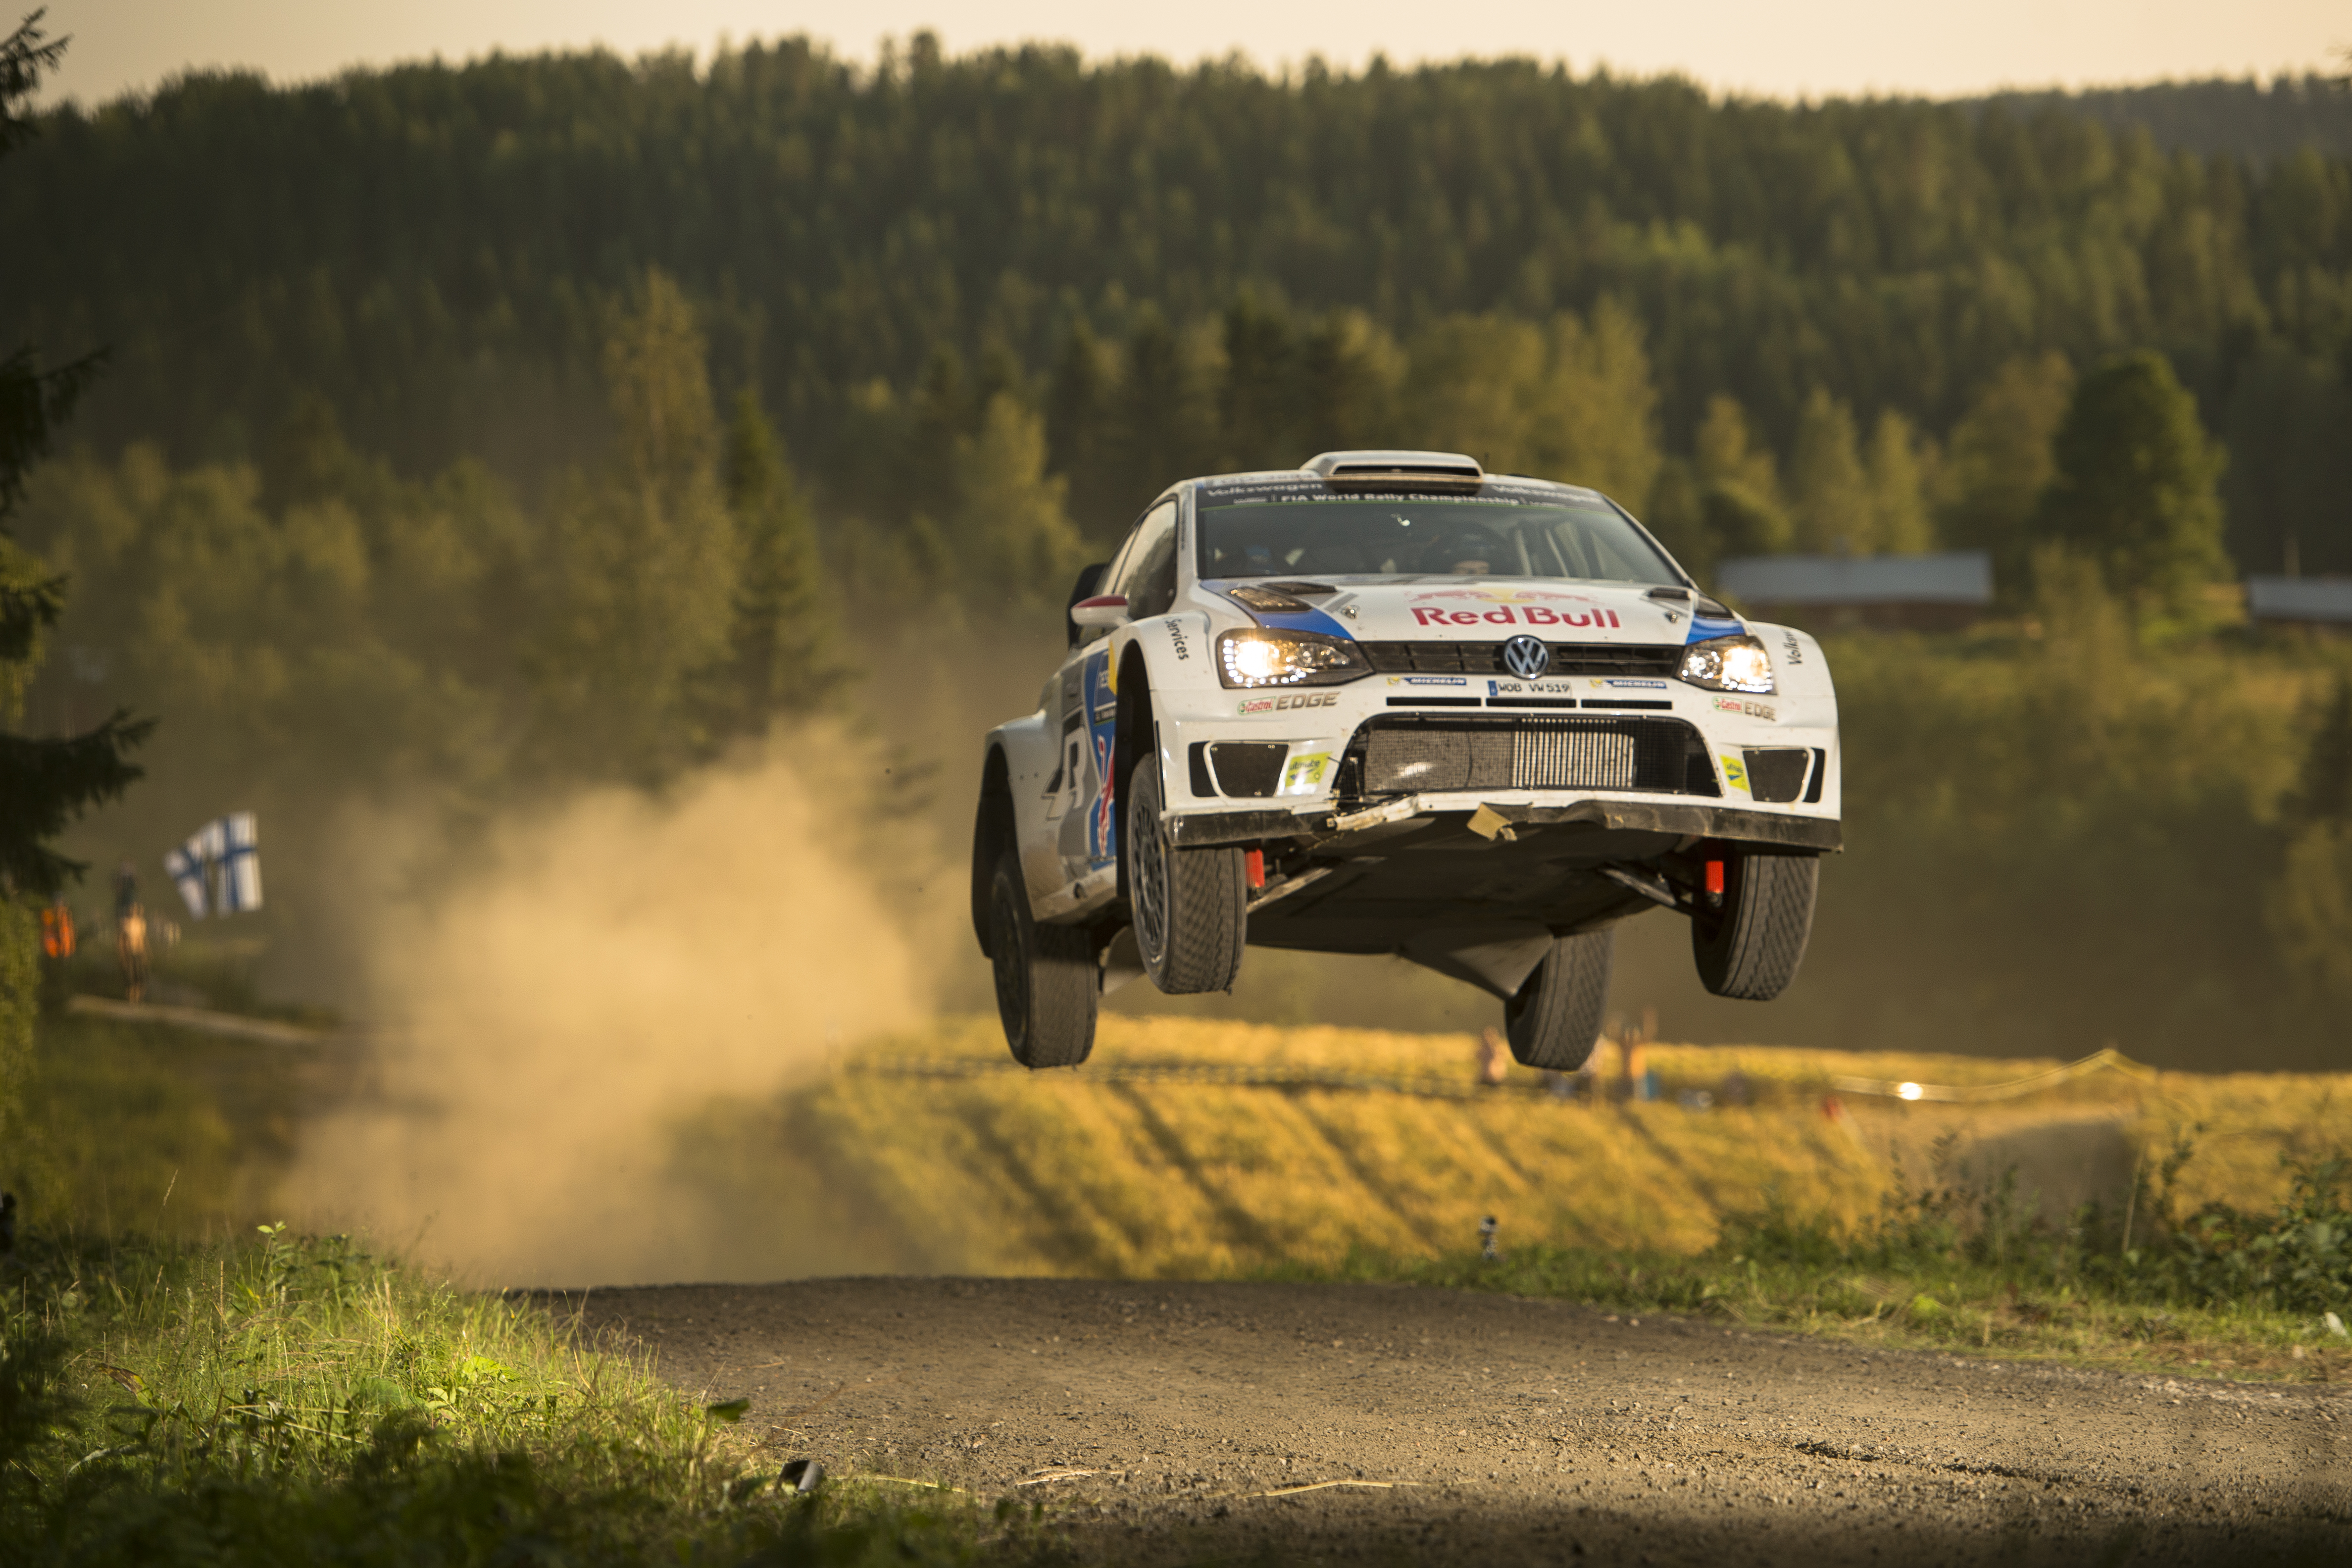 Latvala of Finland races at the FIA World Rally Championship in Jyvaskyla, Finland